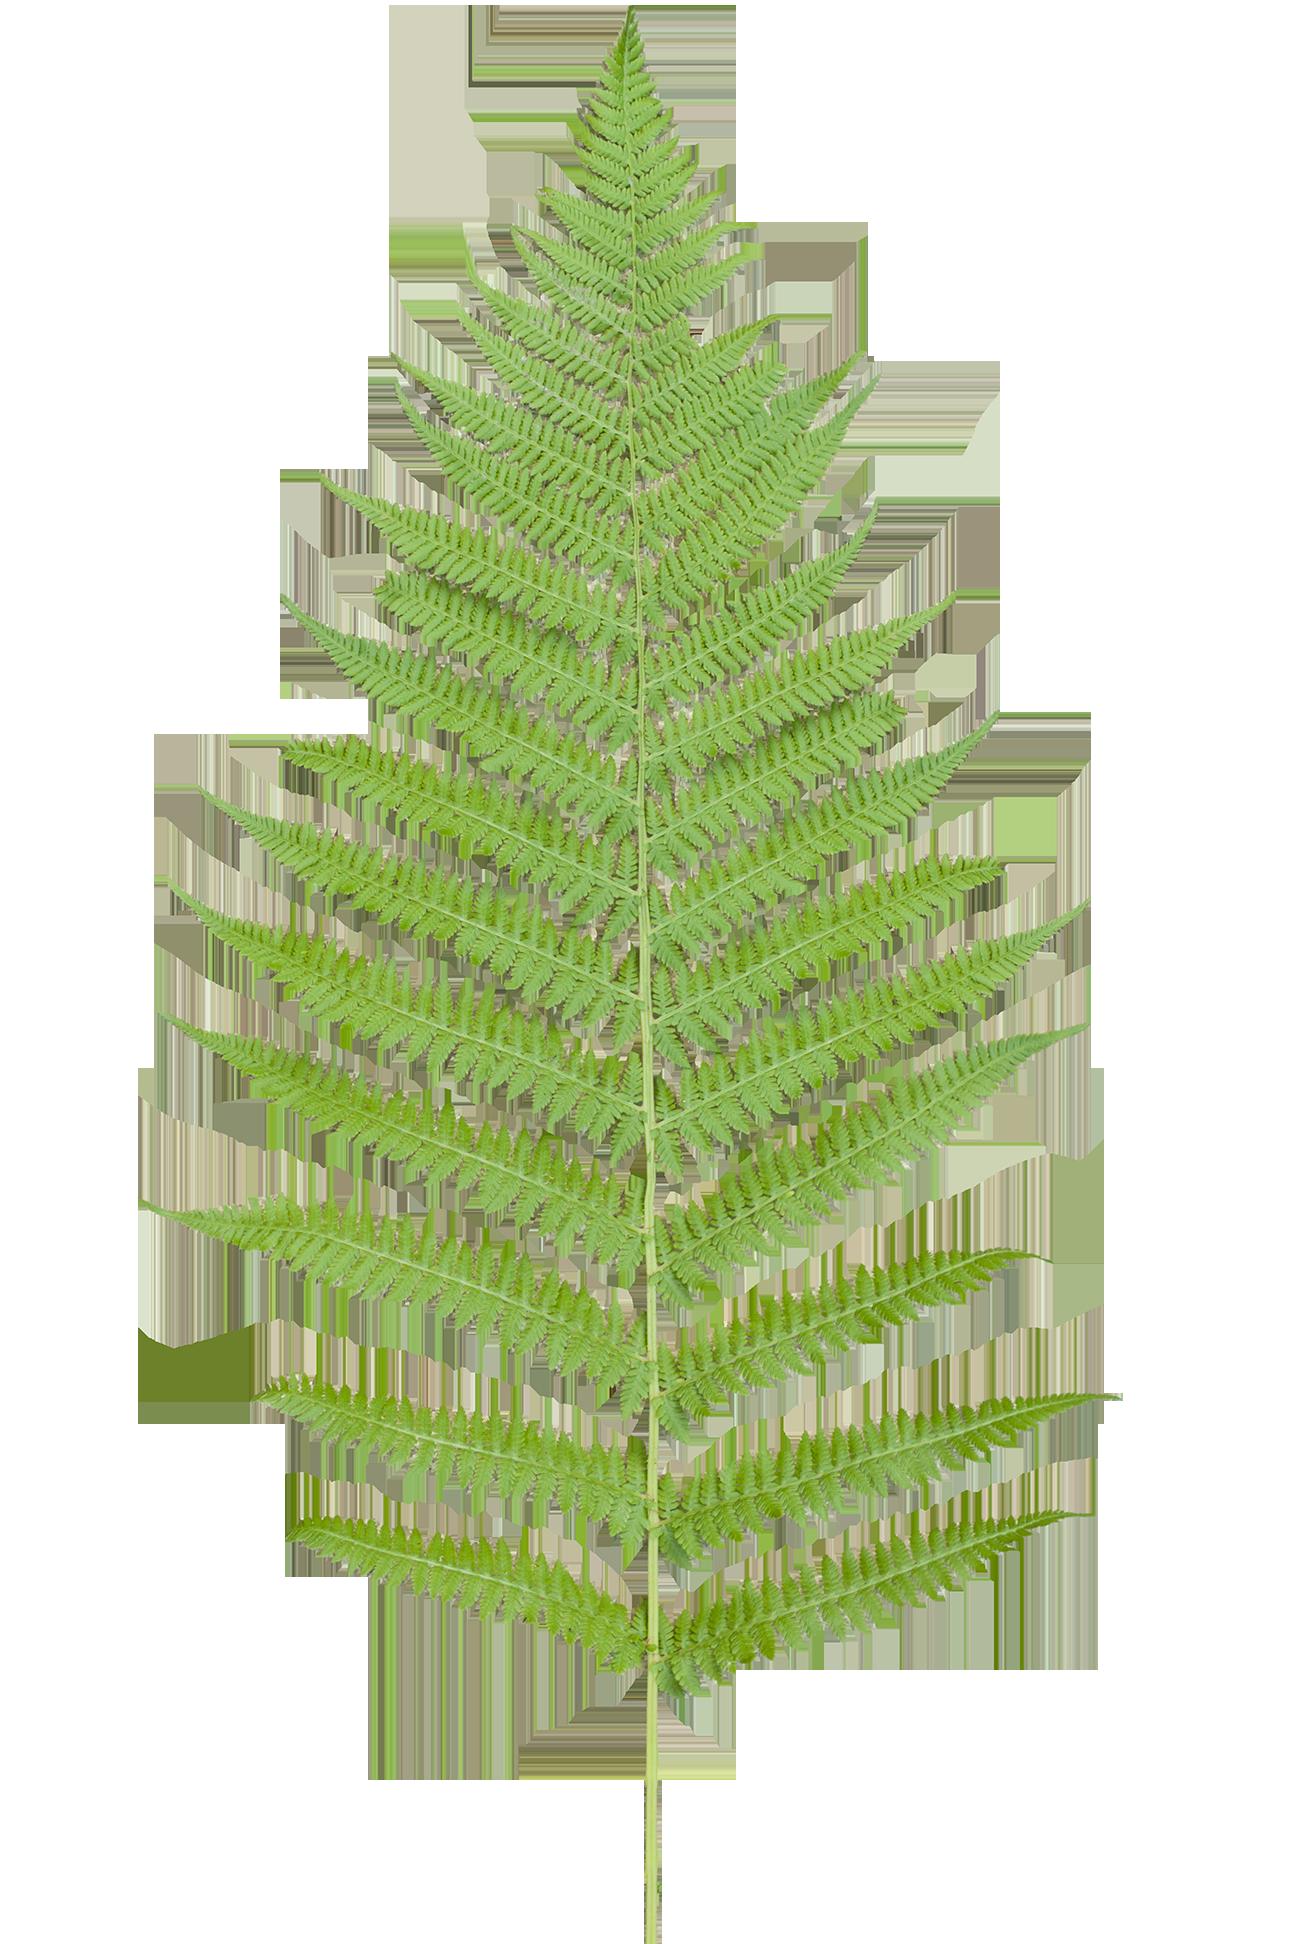 Paramecij s vegetation base. Clipart forest texture